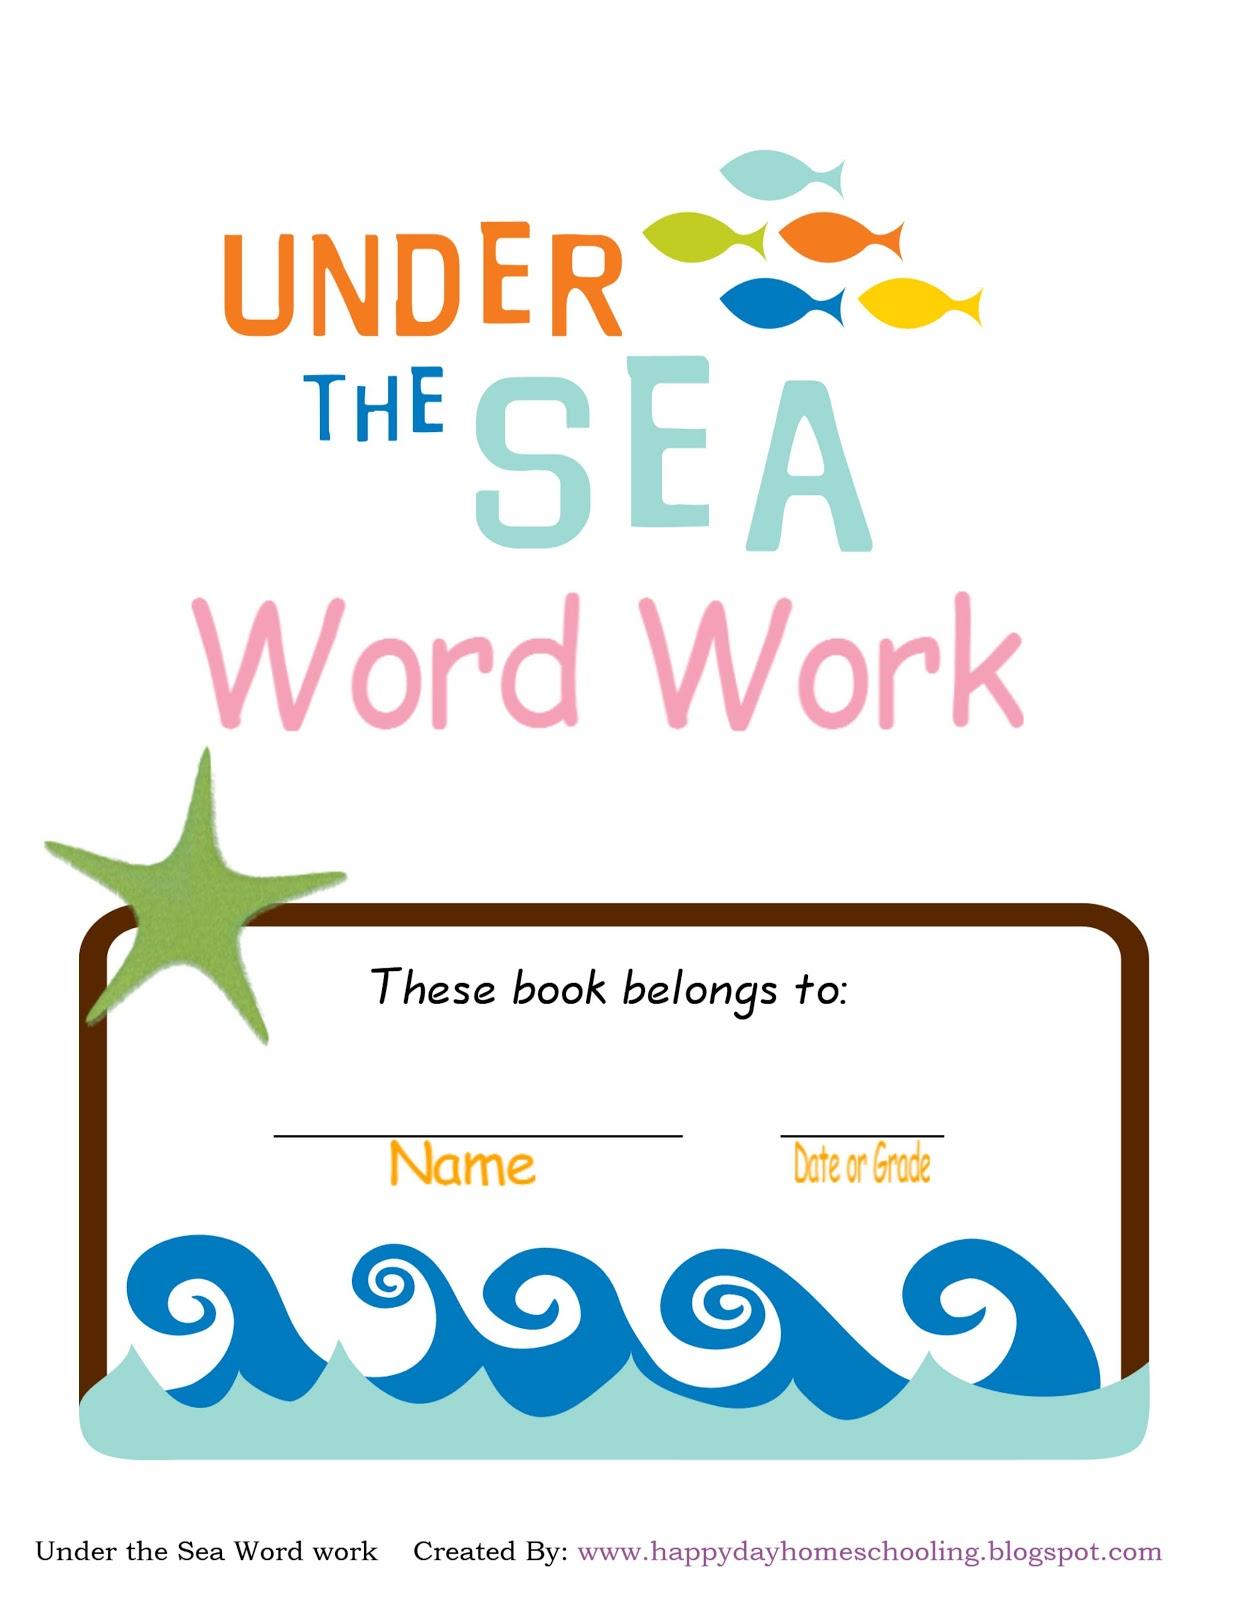 Happy Day Homeschooling Word Work Freebies